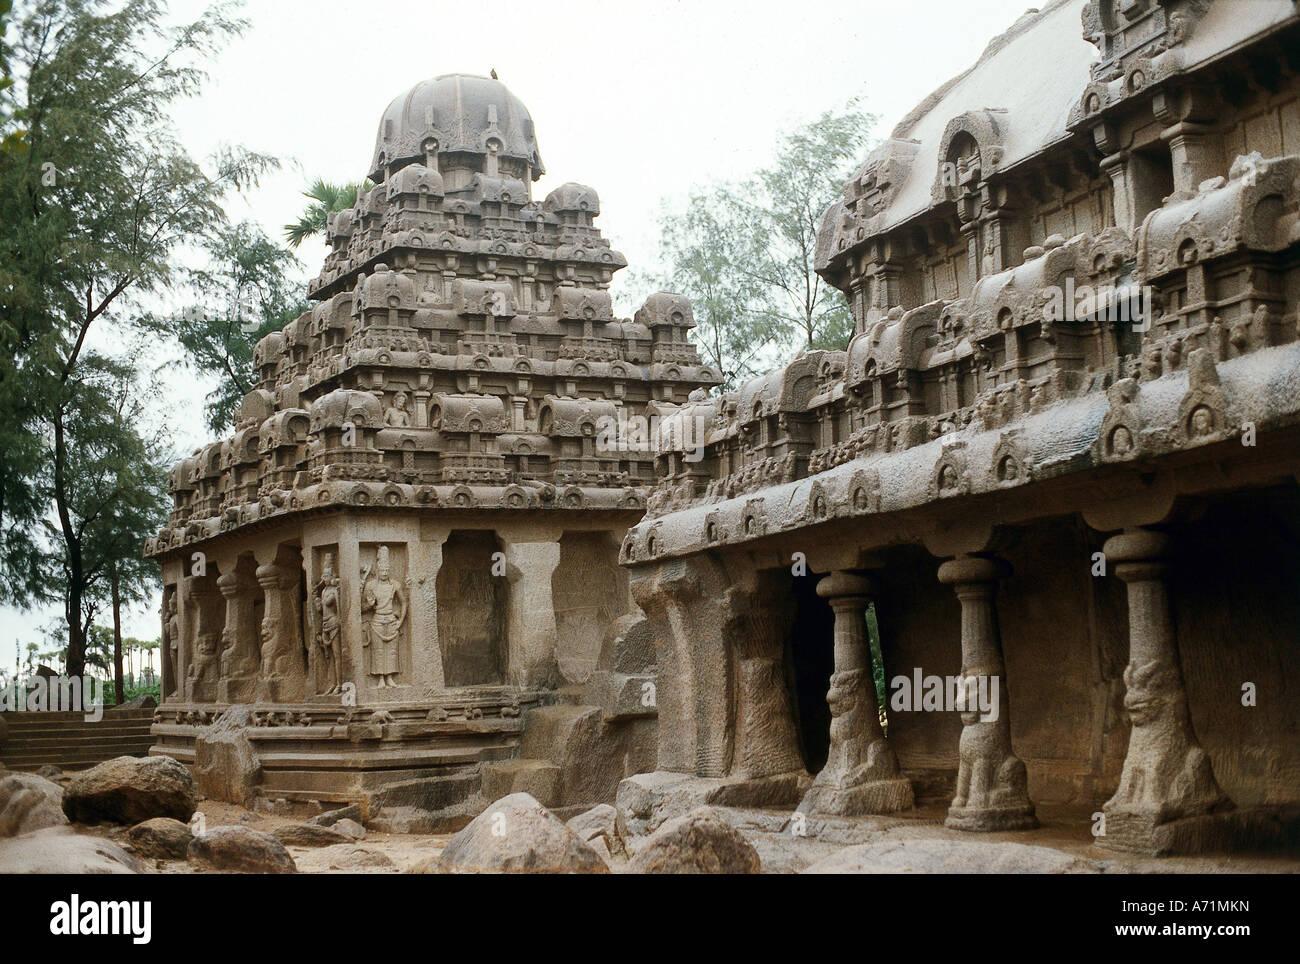 geography / travel, India, Mahabalipuram (Mamallapuram), tamil Nadu, temple, built until 668 AD under Pallava dynasty, - Stock Image